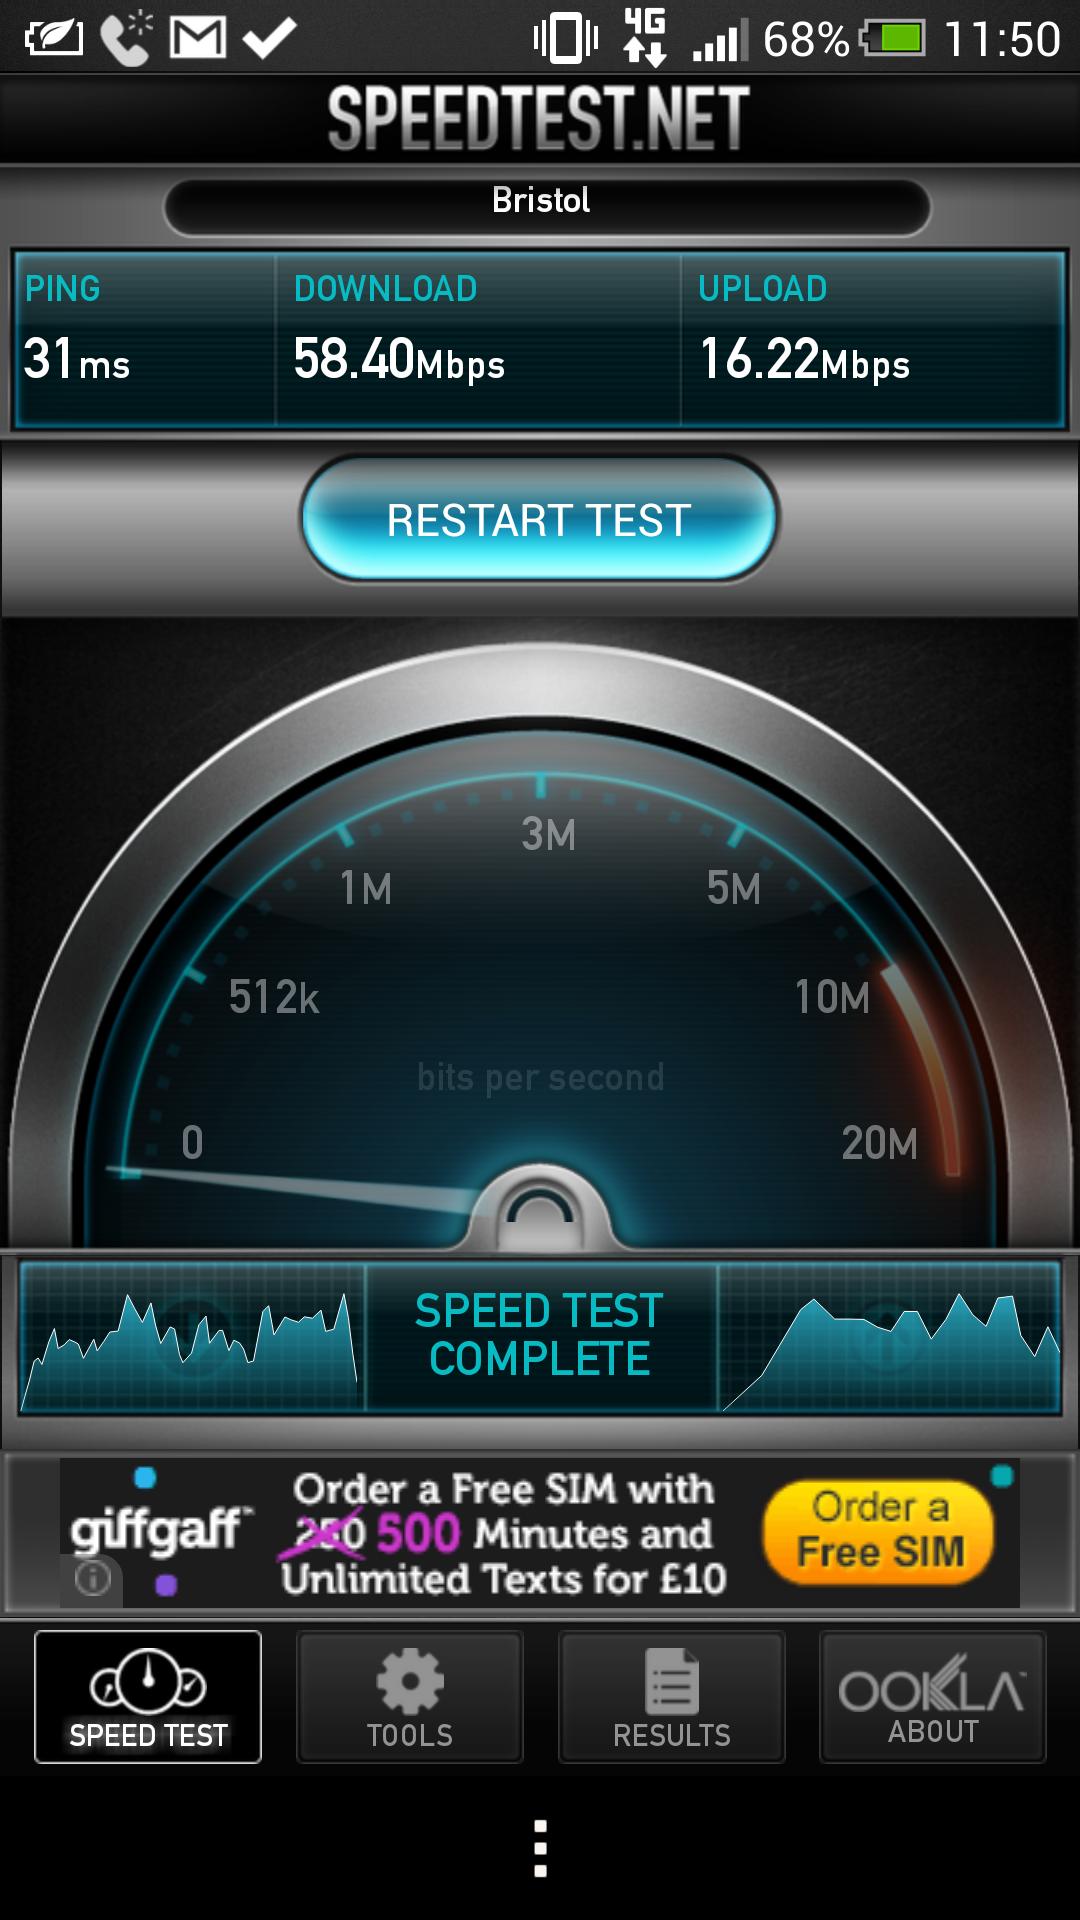 Vodafone 4g Speed Test Results Coolsmartphone